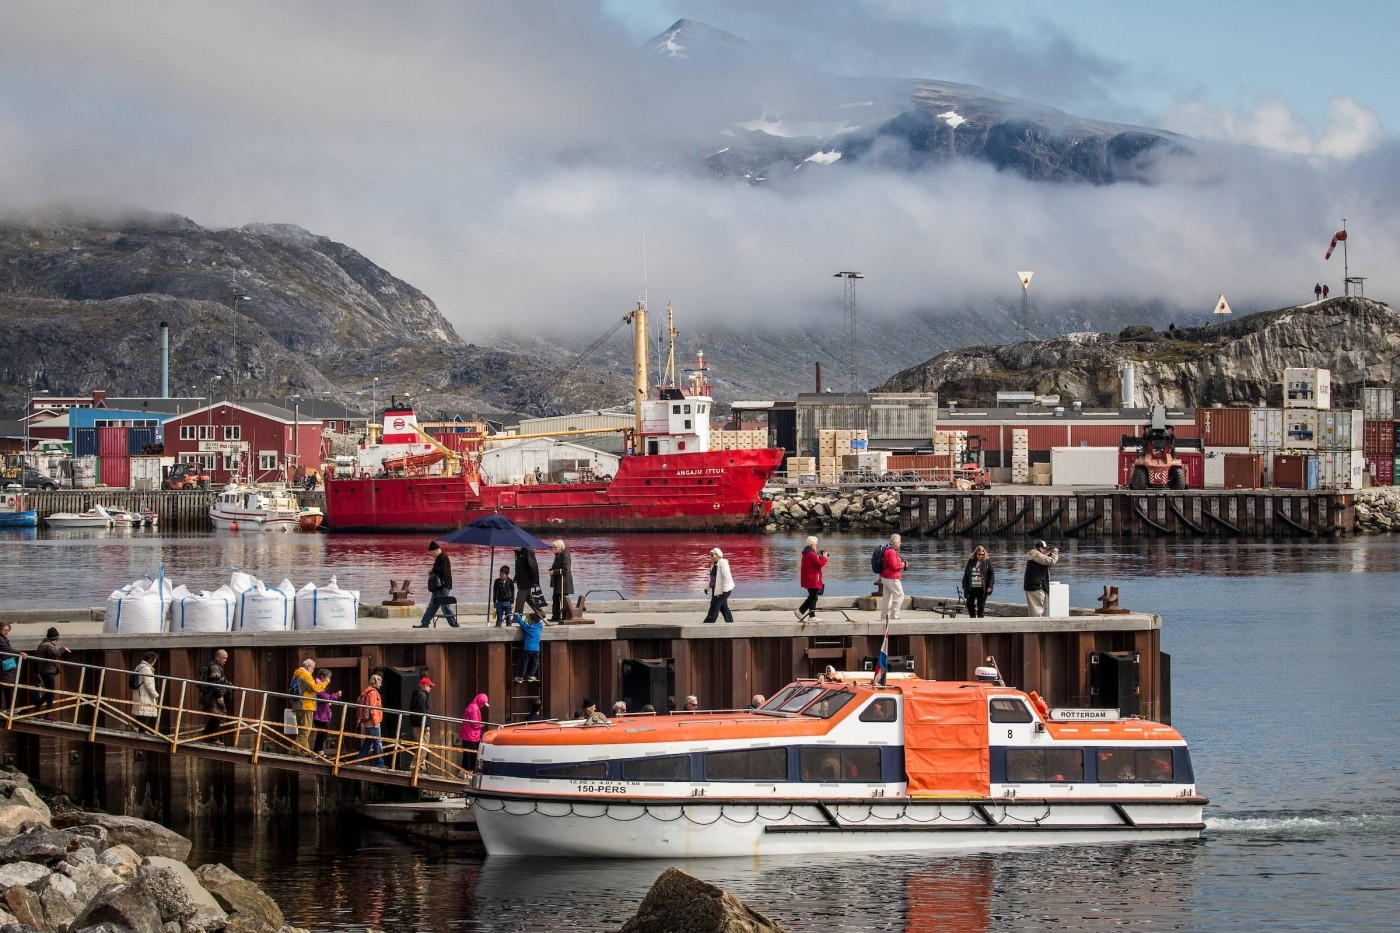 Nanortalik-2016-92. Photo by Mads Pihl - Visit Greenland